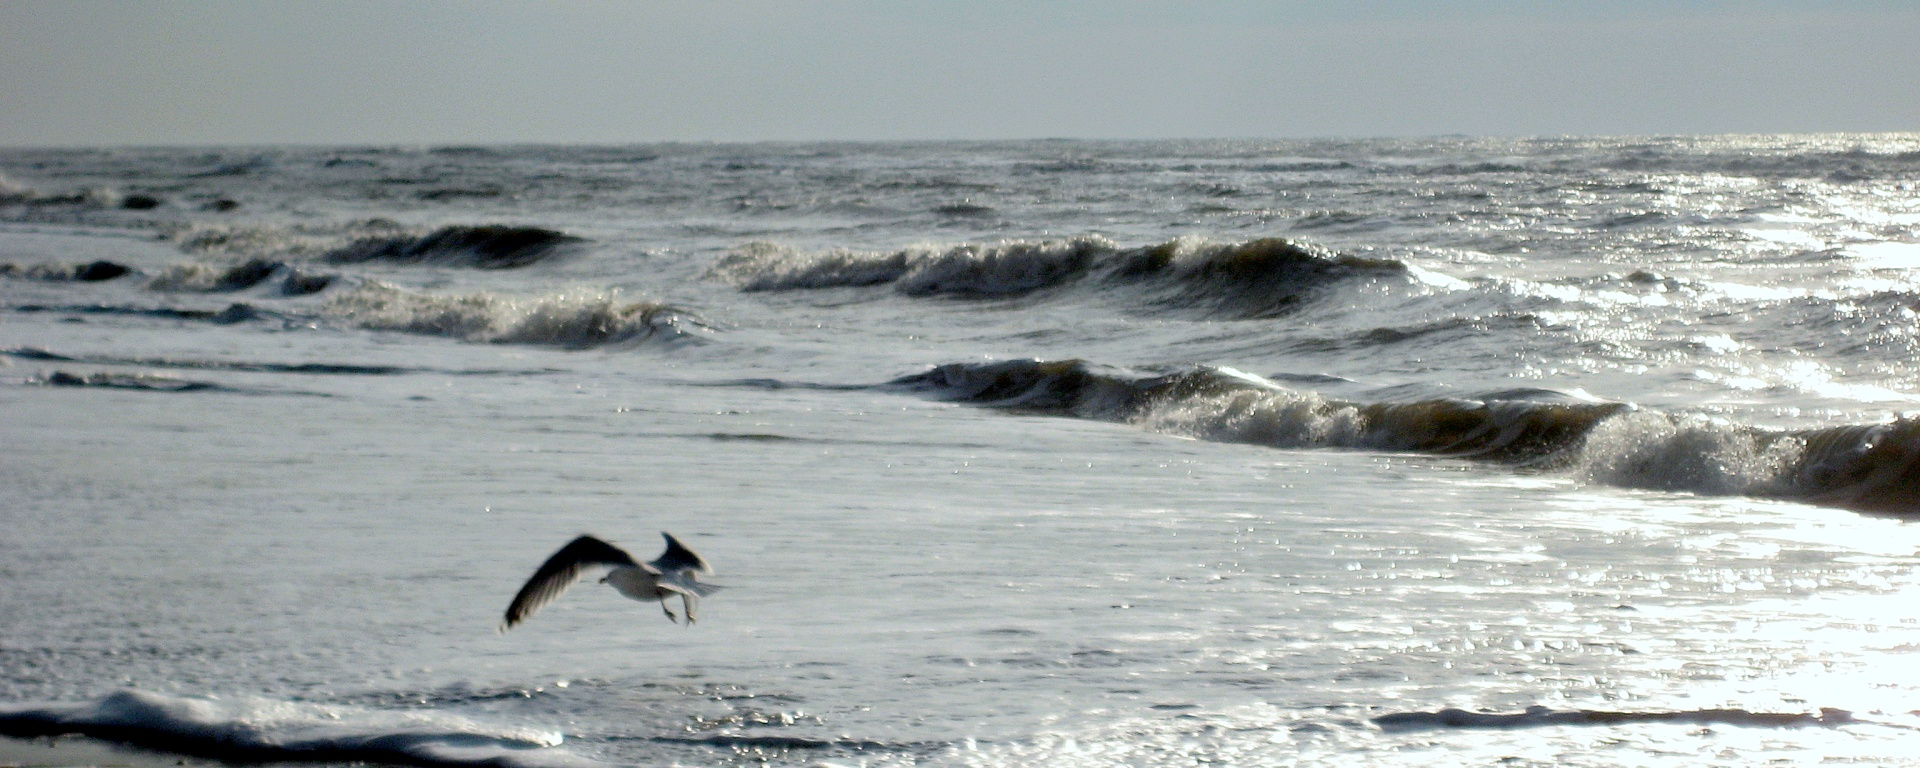 castricum aan zee   witchwithaview